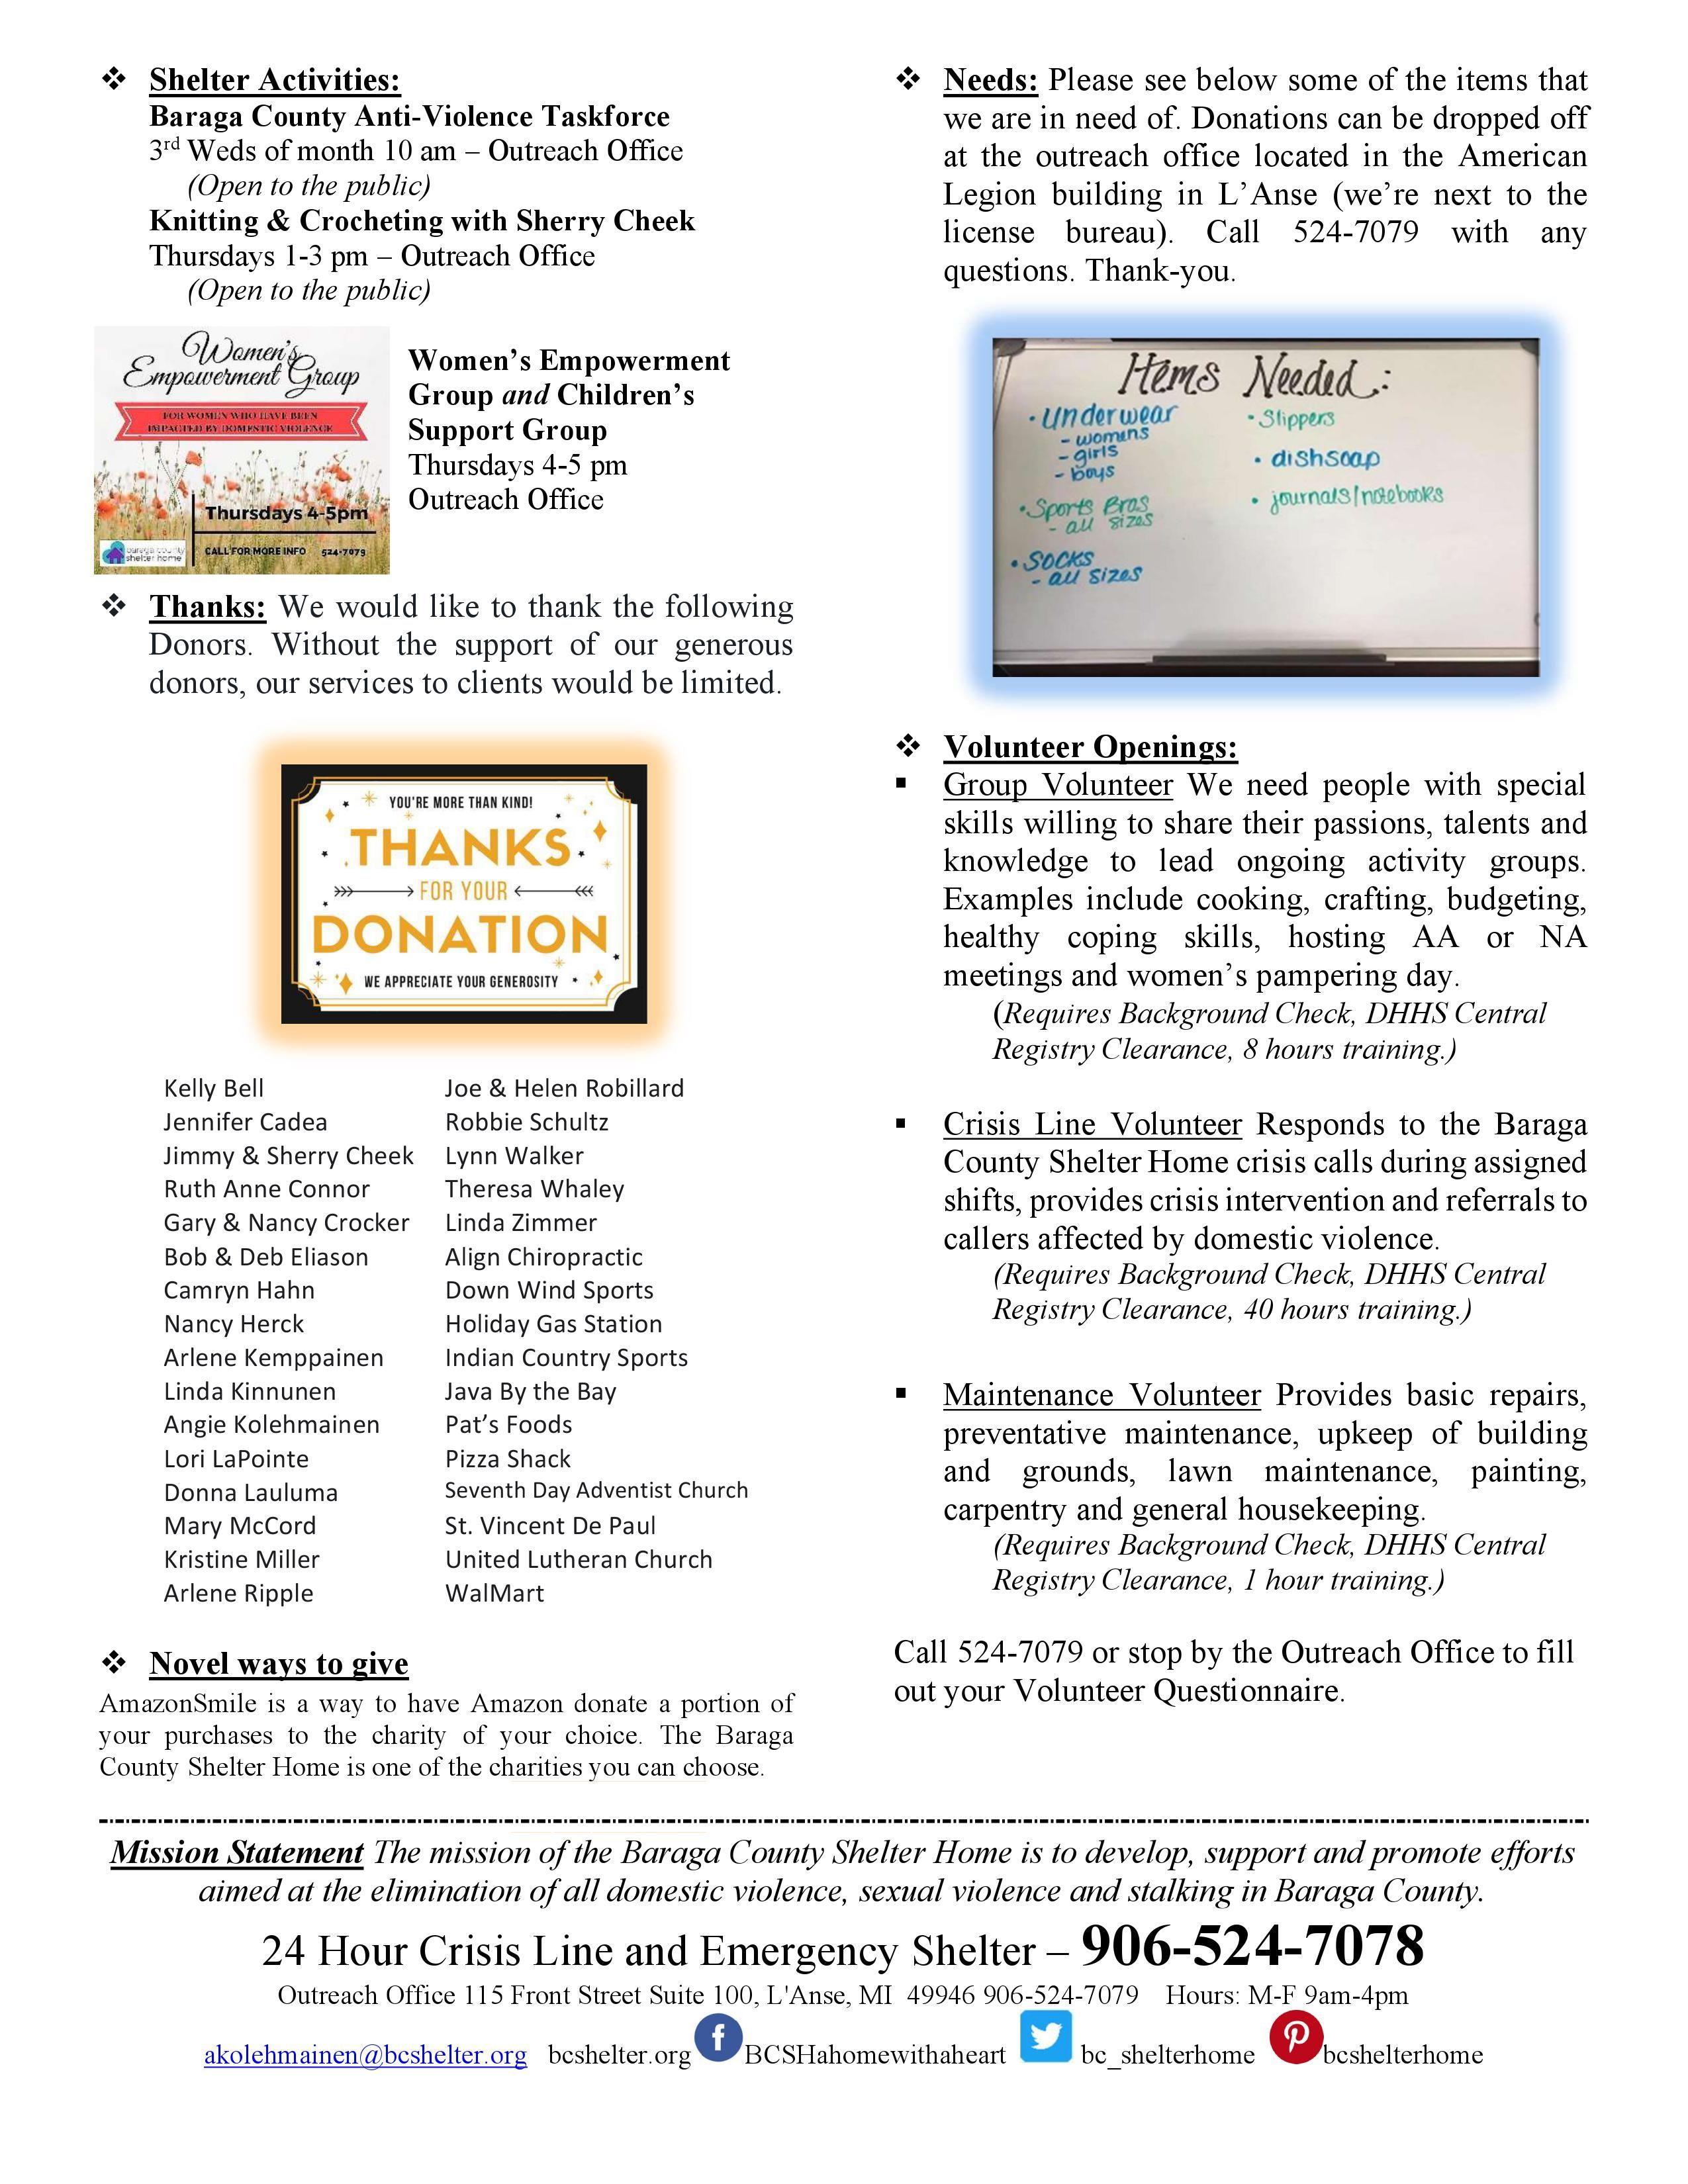 September Newsletter page 2